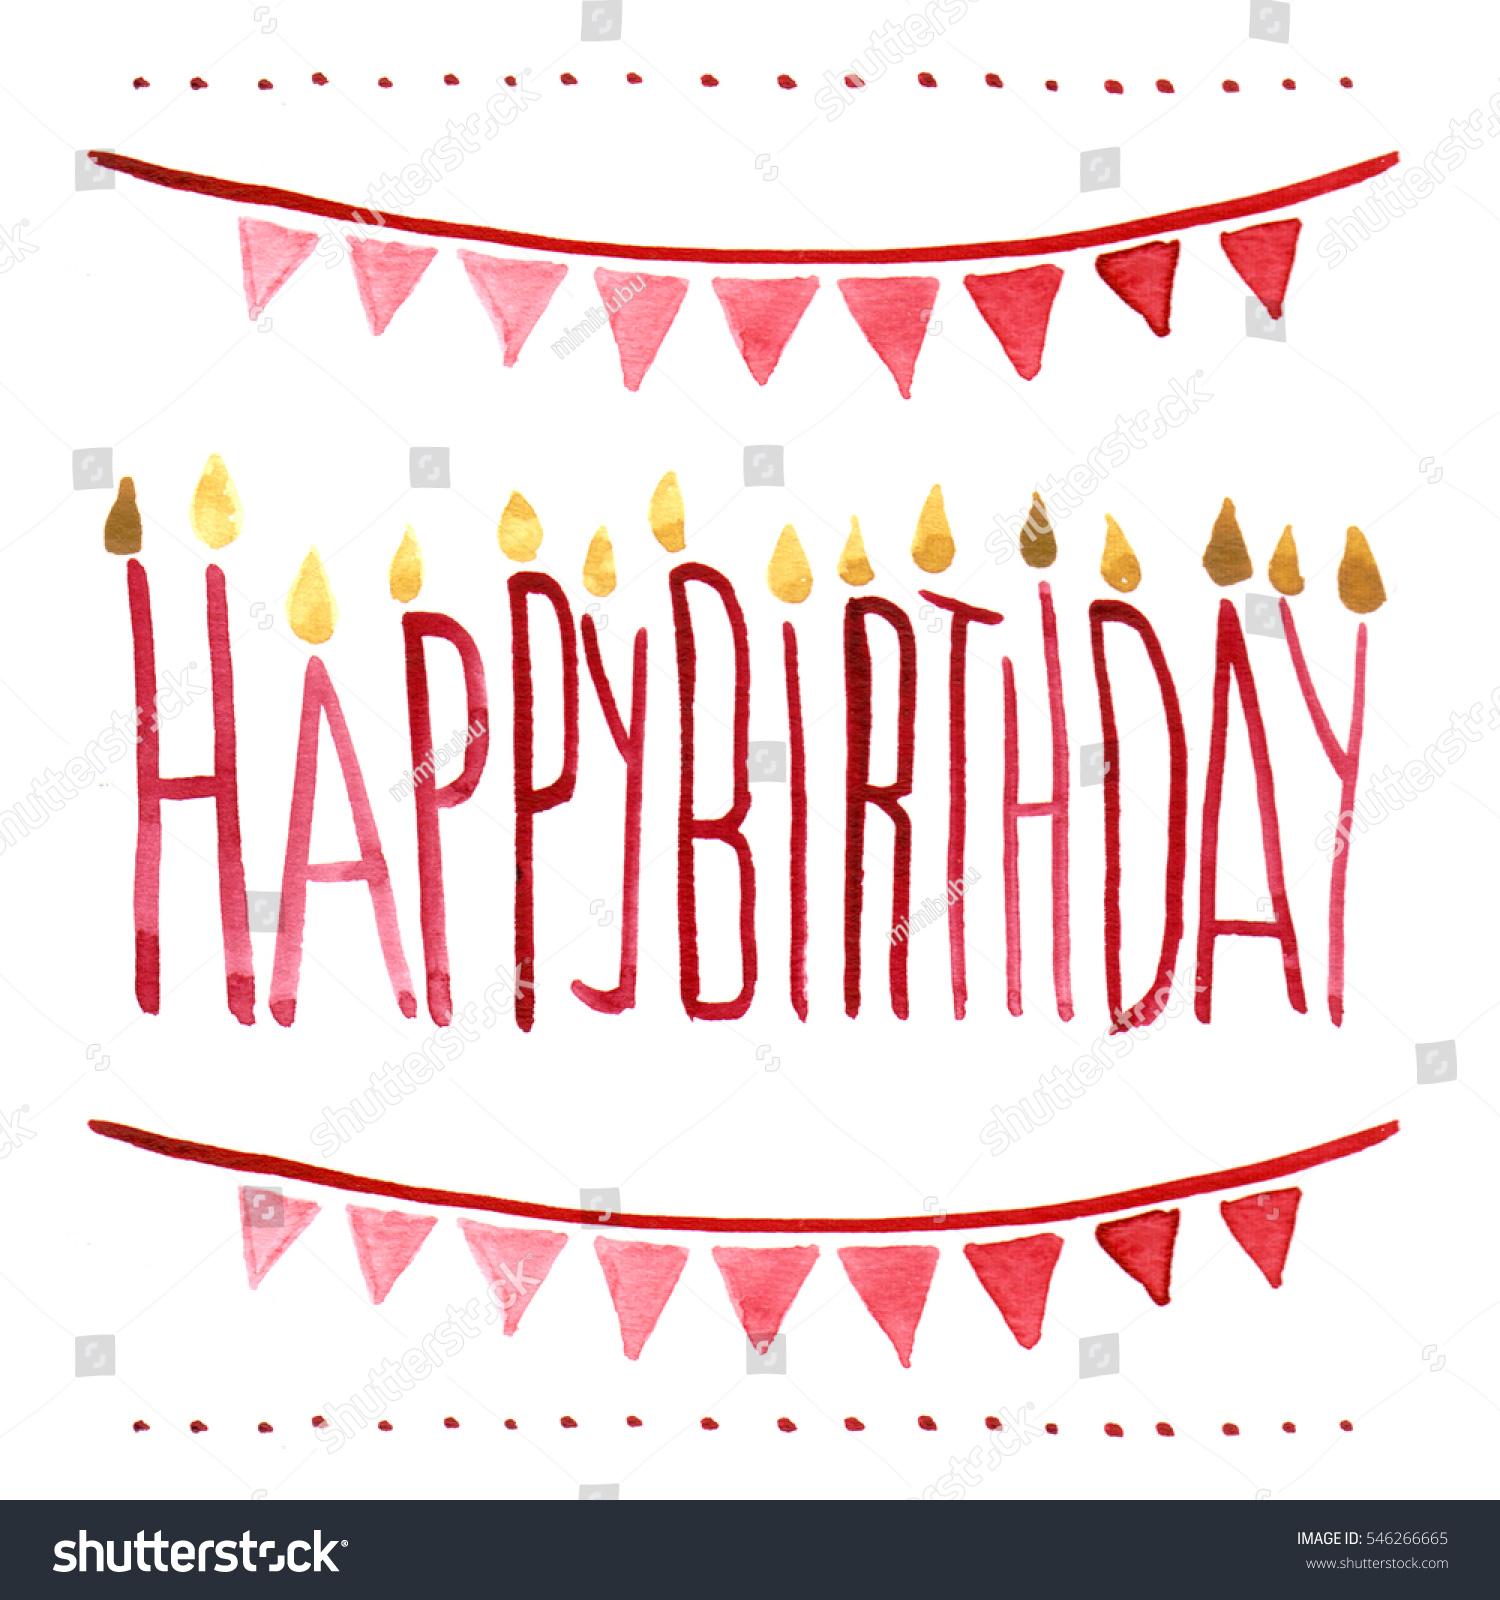 Isolated Watercolour Illustration Happy Birthday Card